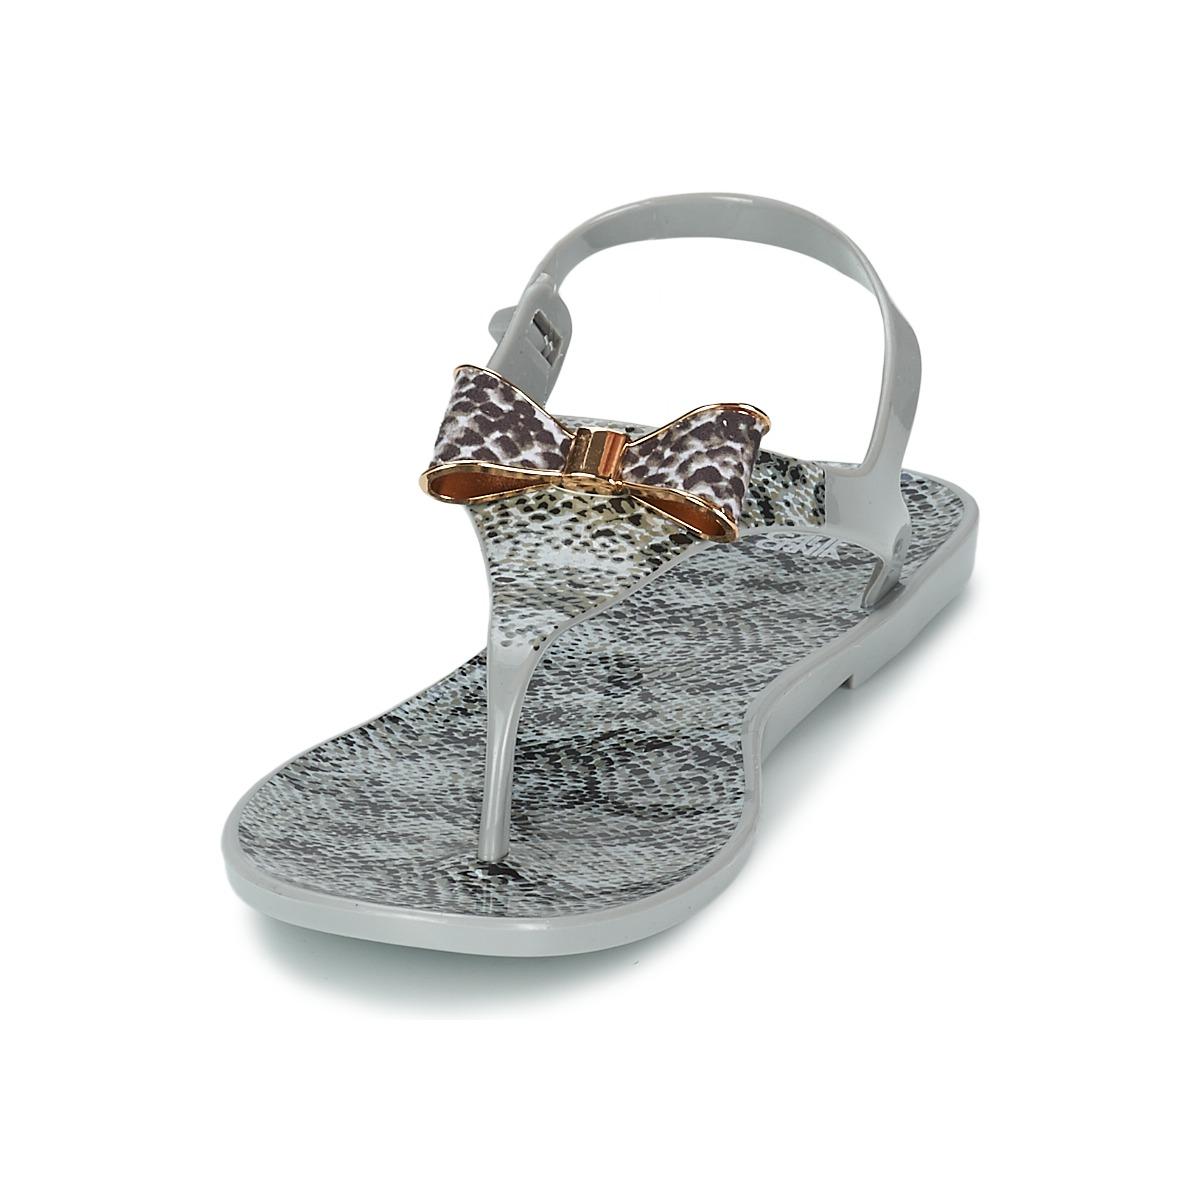 Colors of California Snake Sandal outlet pre order fast delivery sale online original dyu1GHL